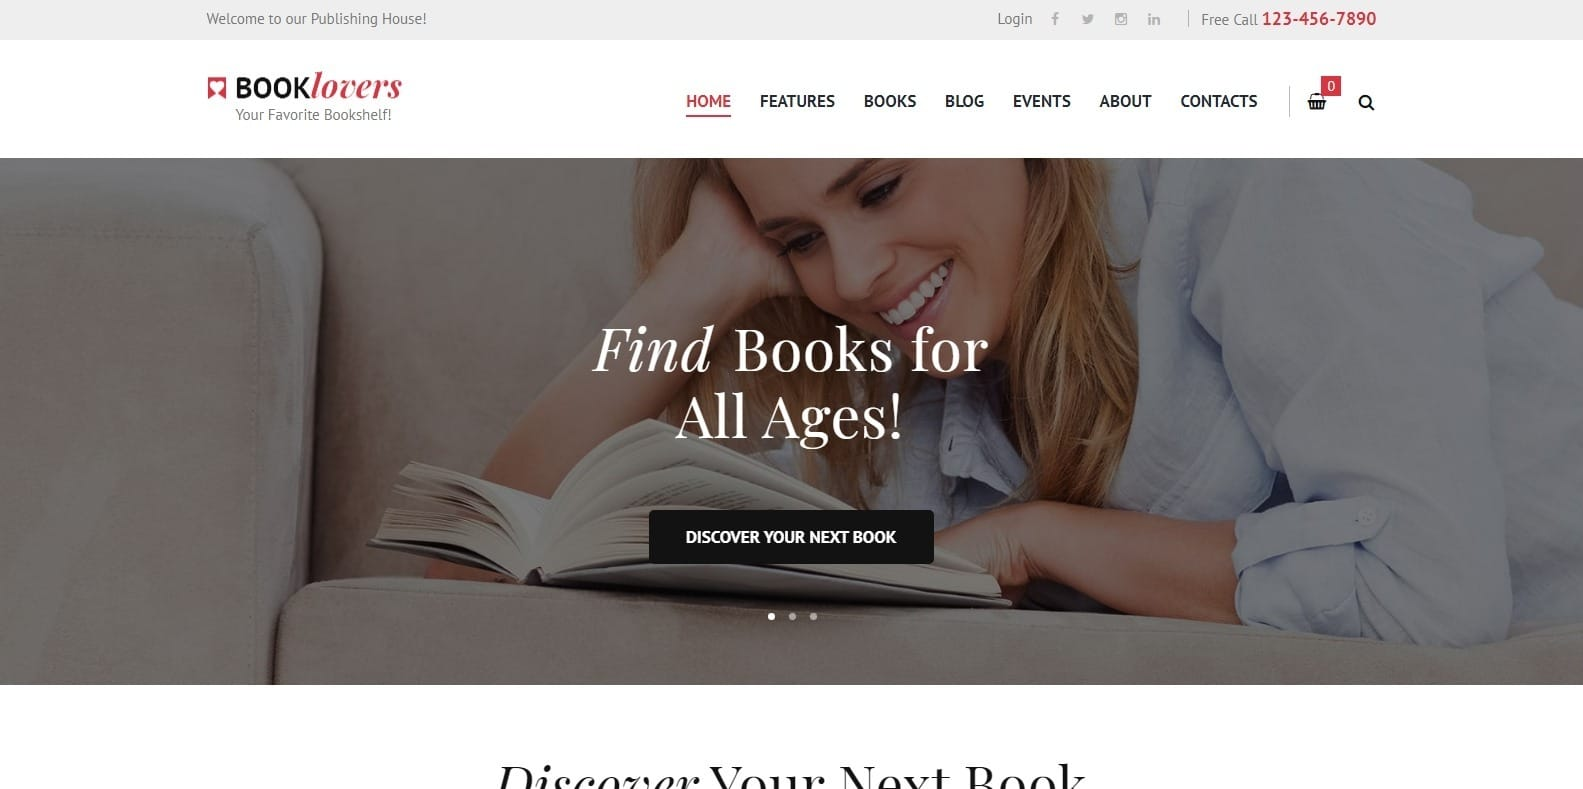 booklovers-html-bookstore-website-template